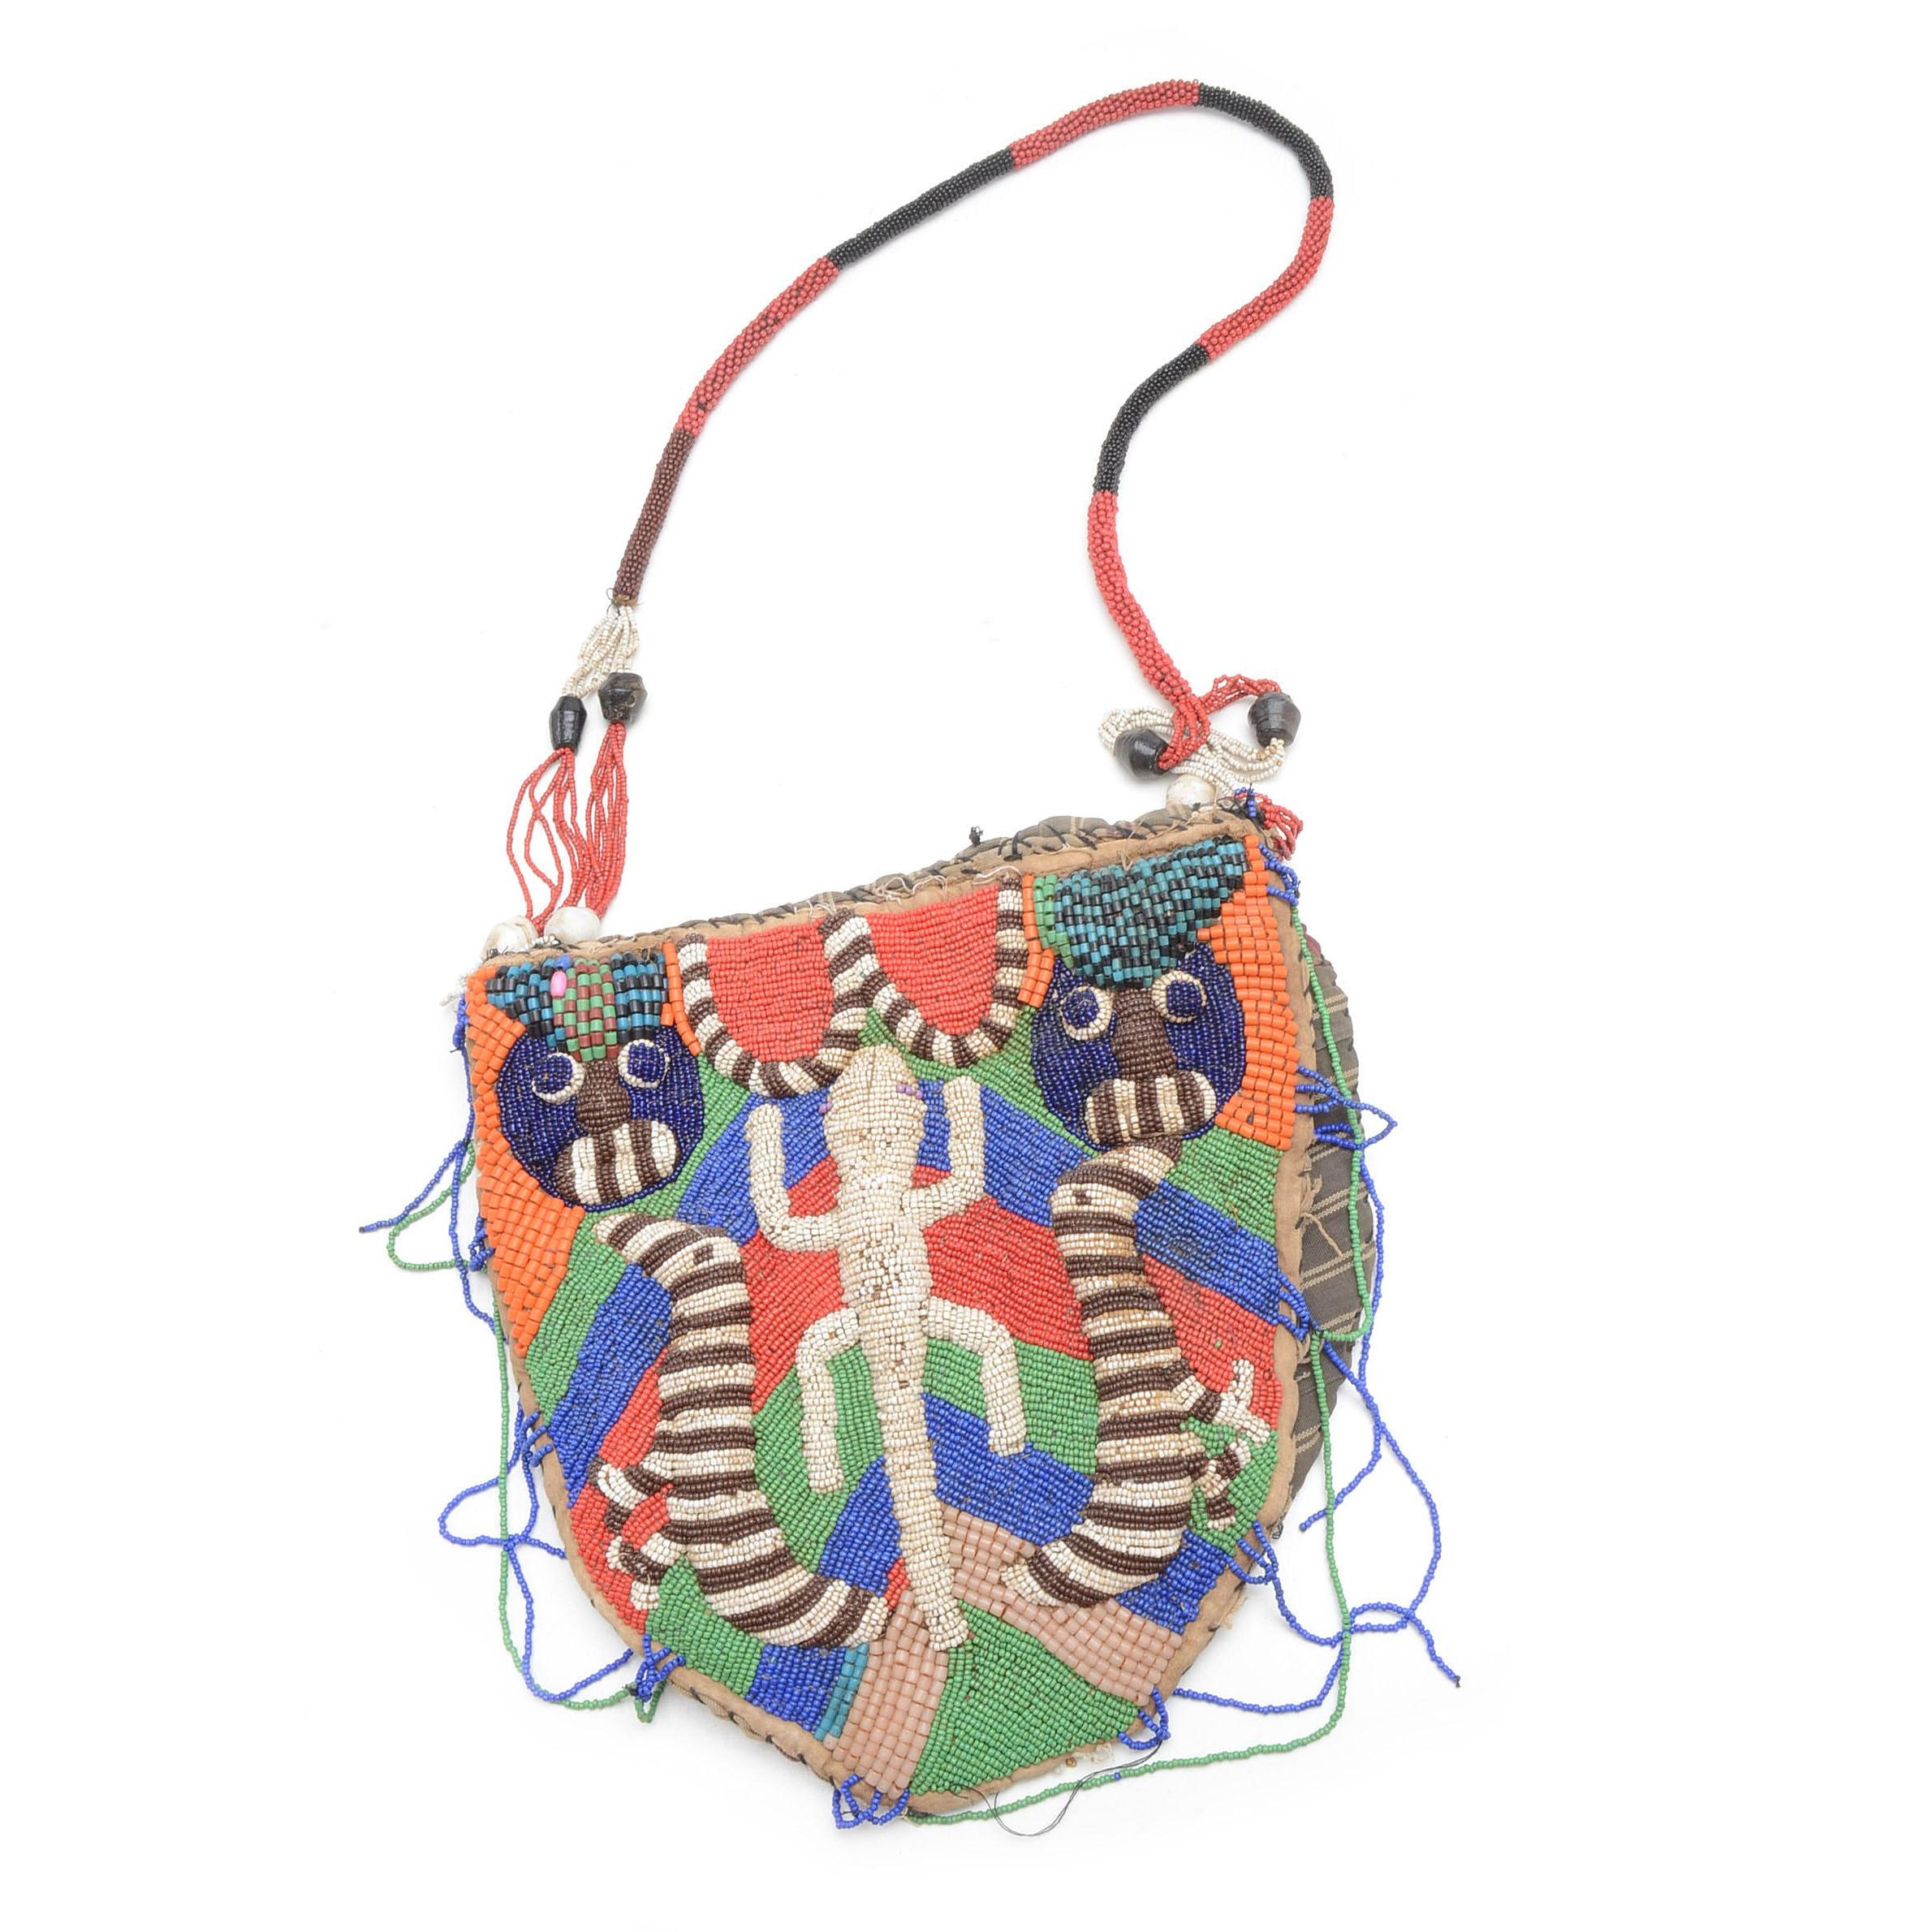 Vintage Yoruba Beaded Diviners Bag